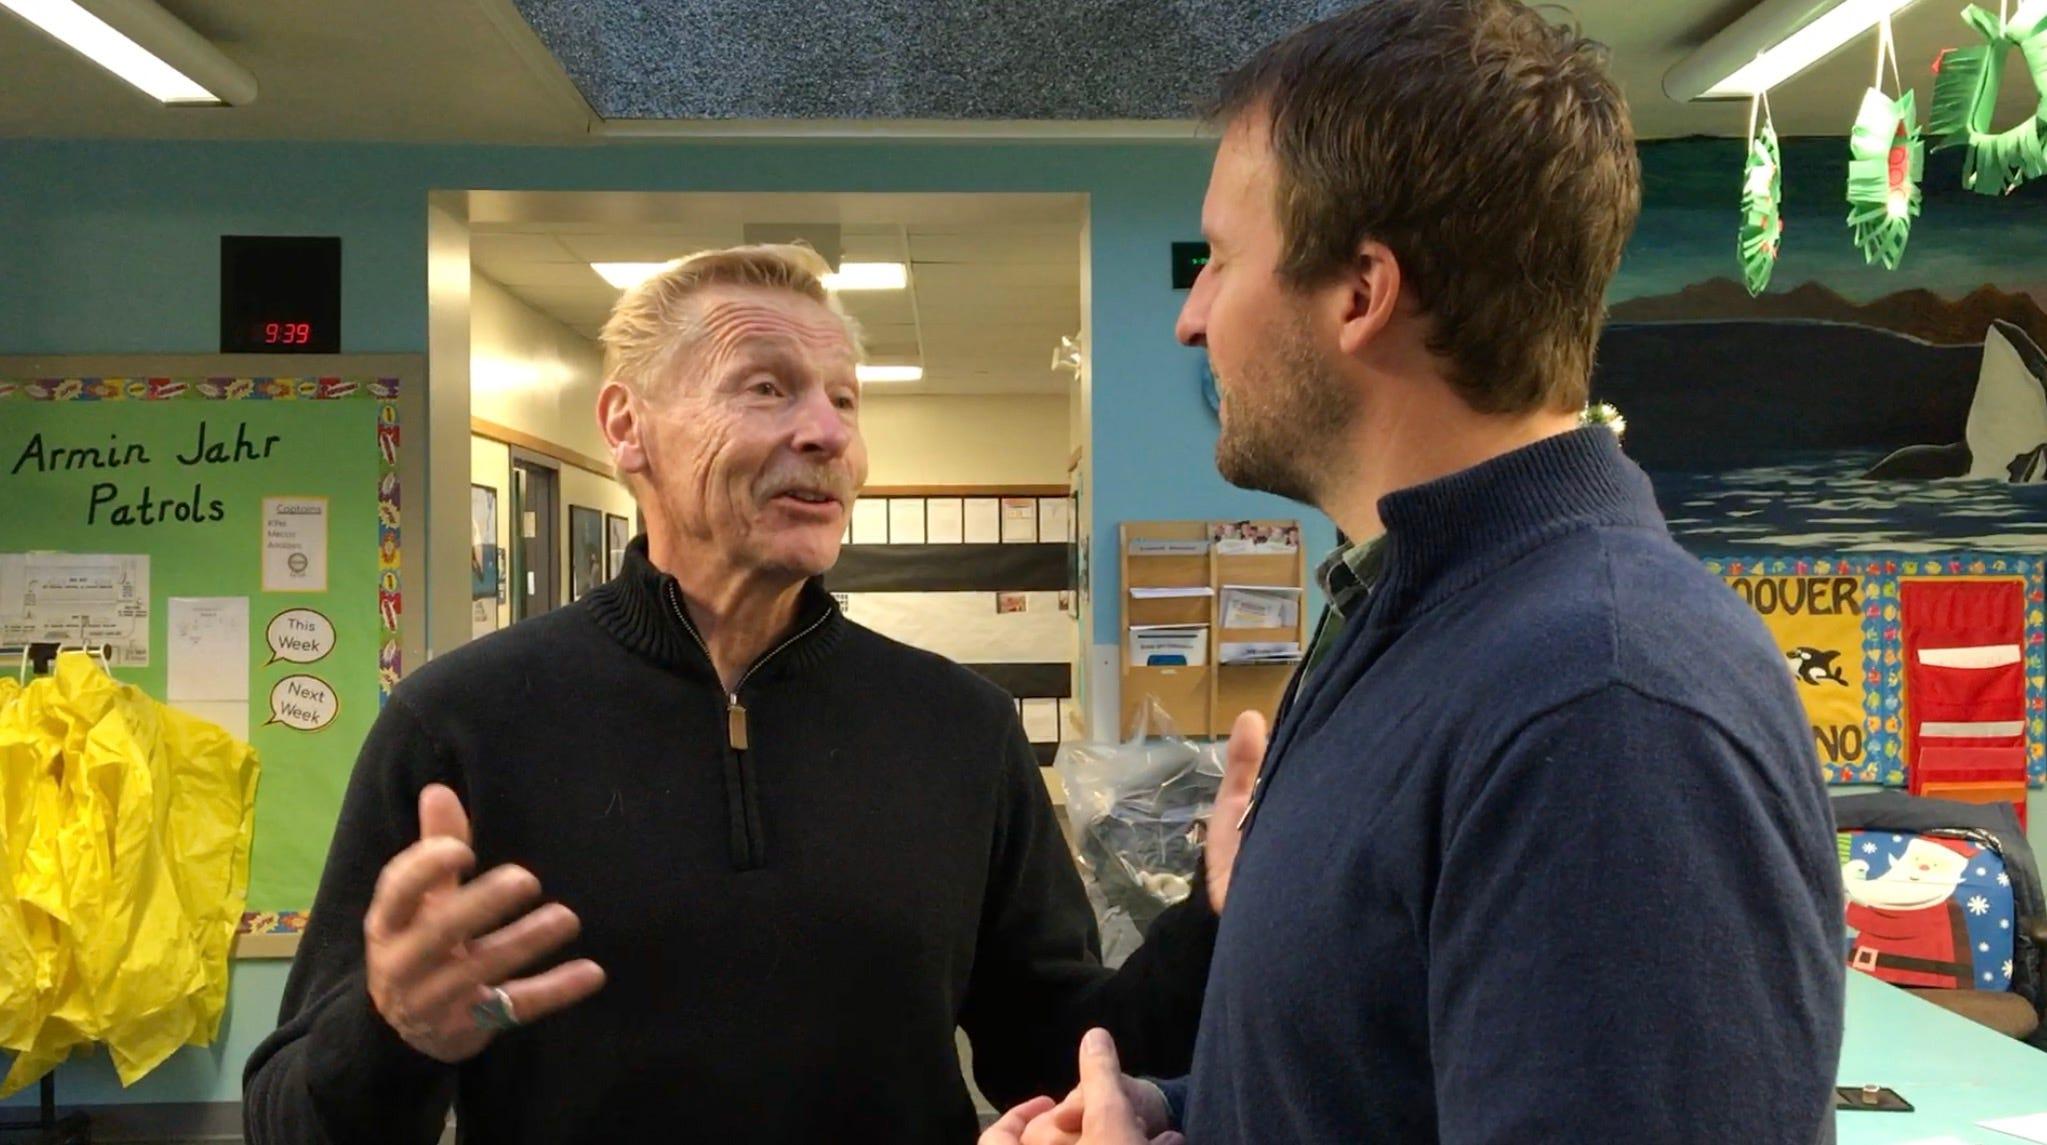 Josh Farley interviews John Sitton, educator, coach and grandson of Armin Jahr.